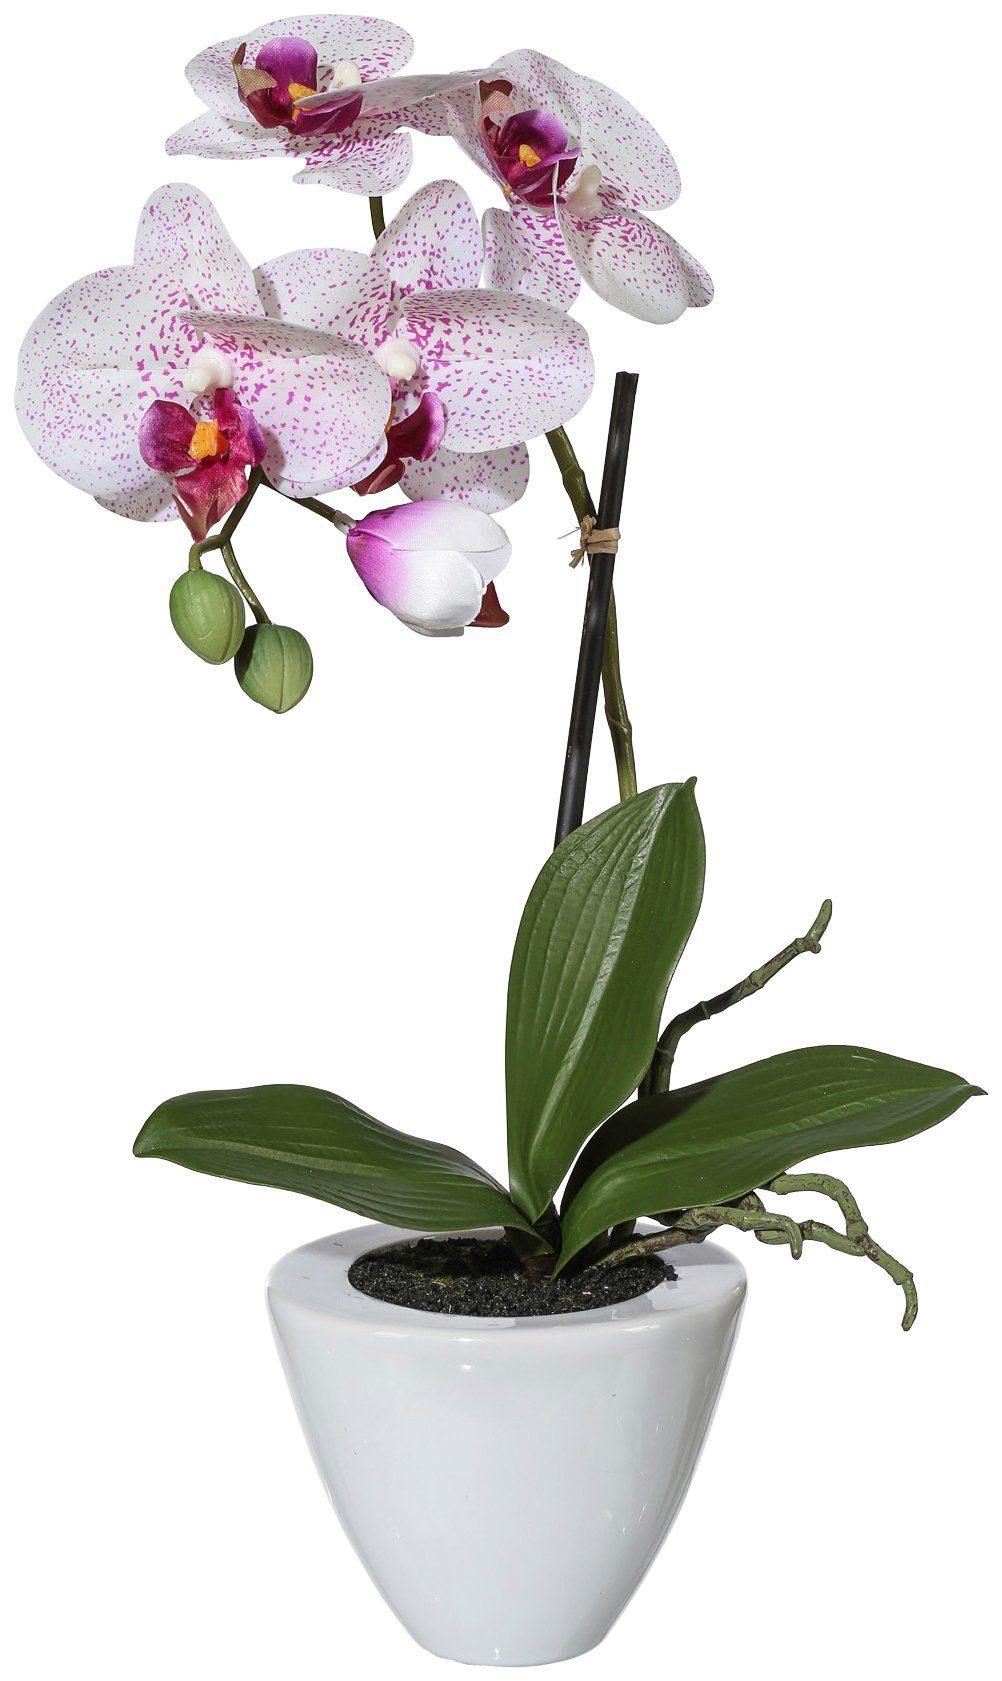 Kunstpflanze »Orchidee Phalaenopsis«, im Keramiktopf, Höhe 36 cm, weiß/lila